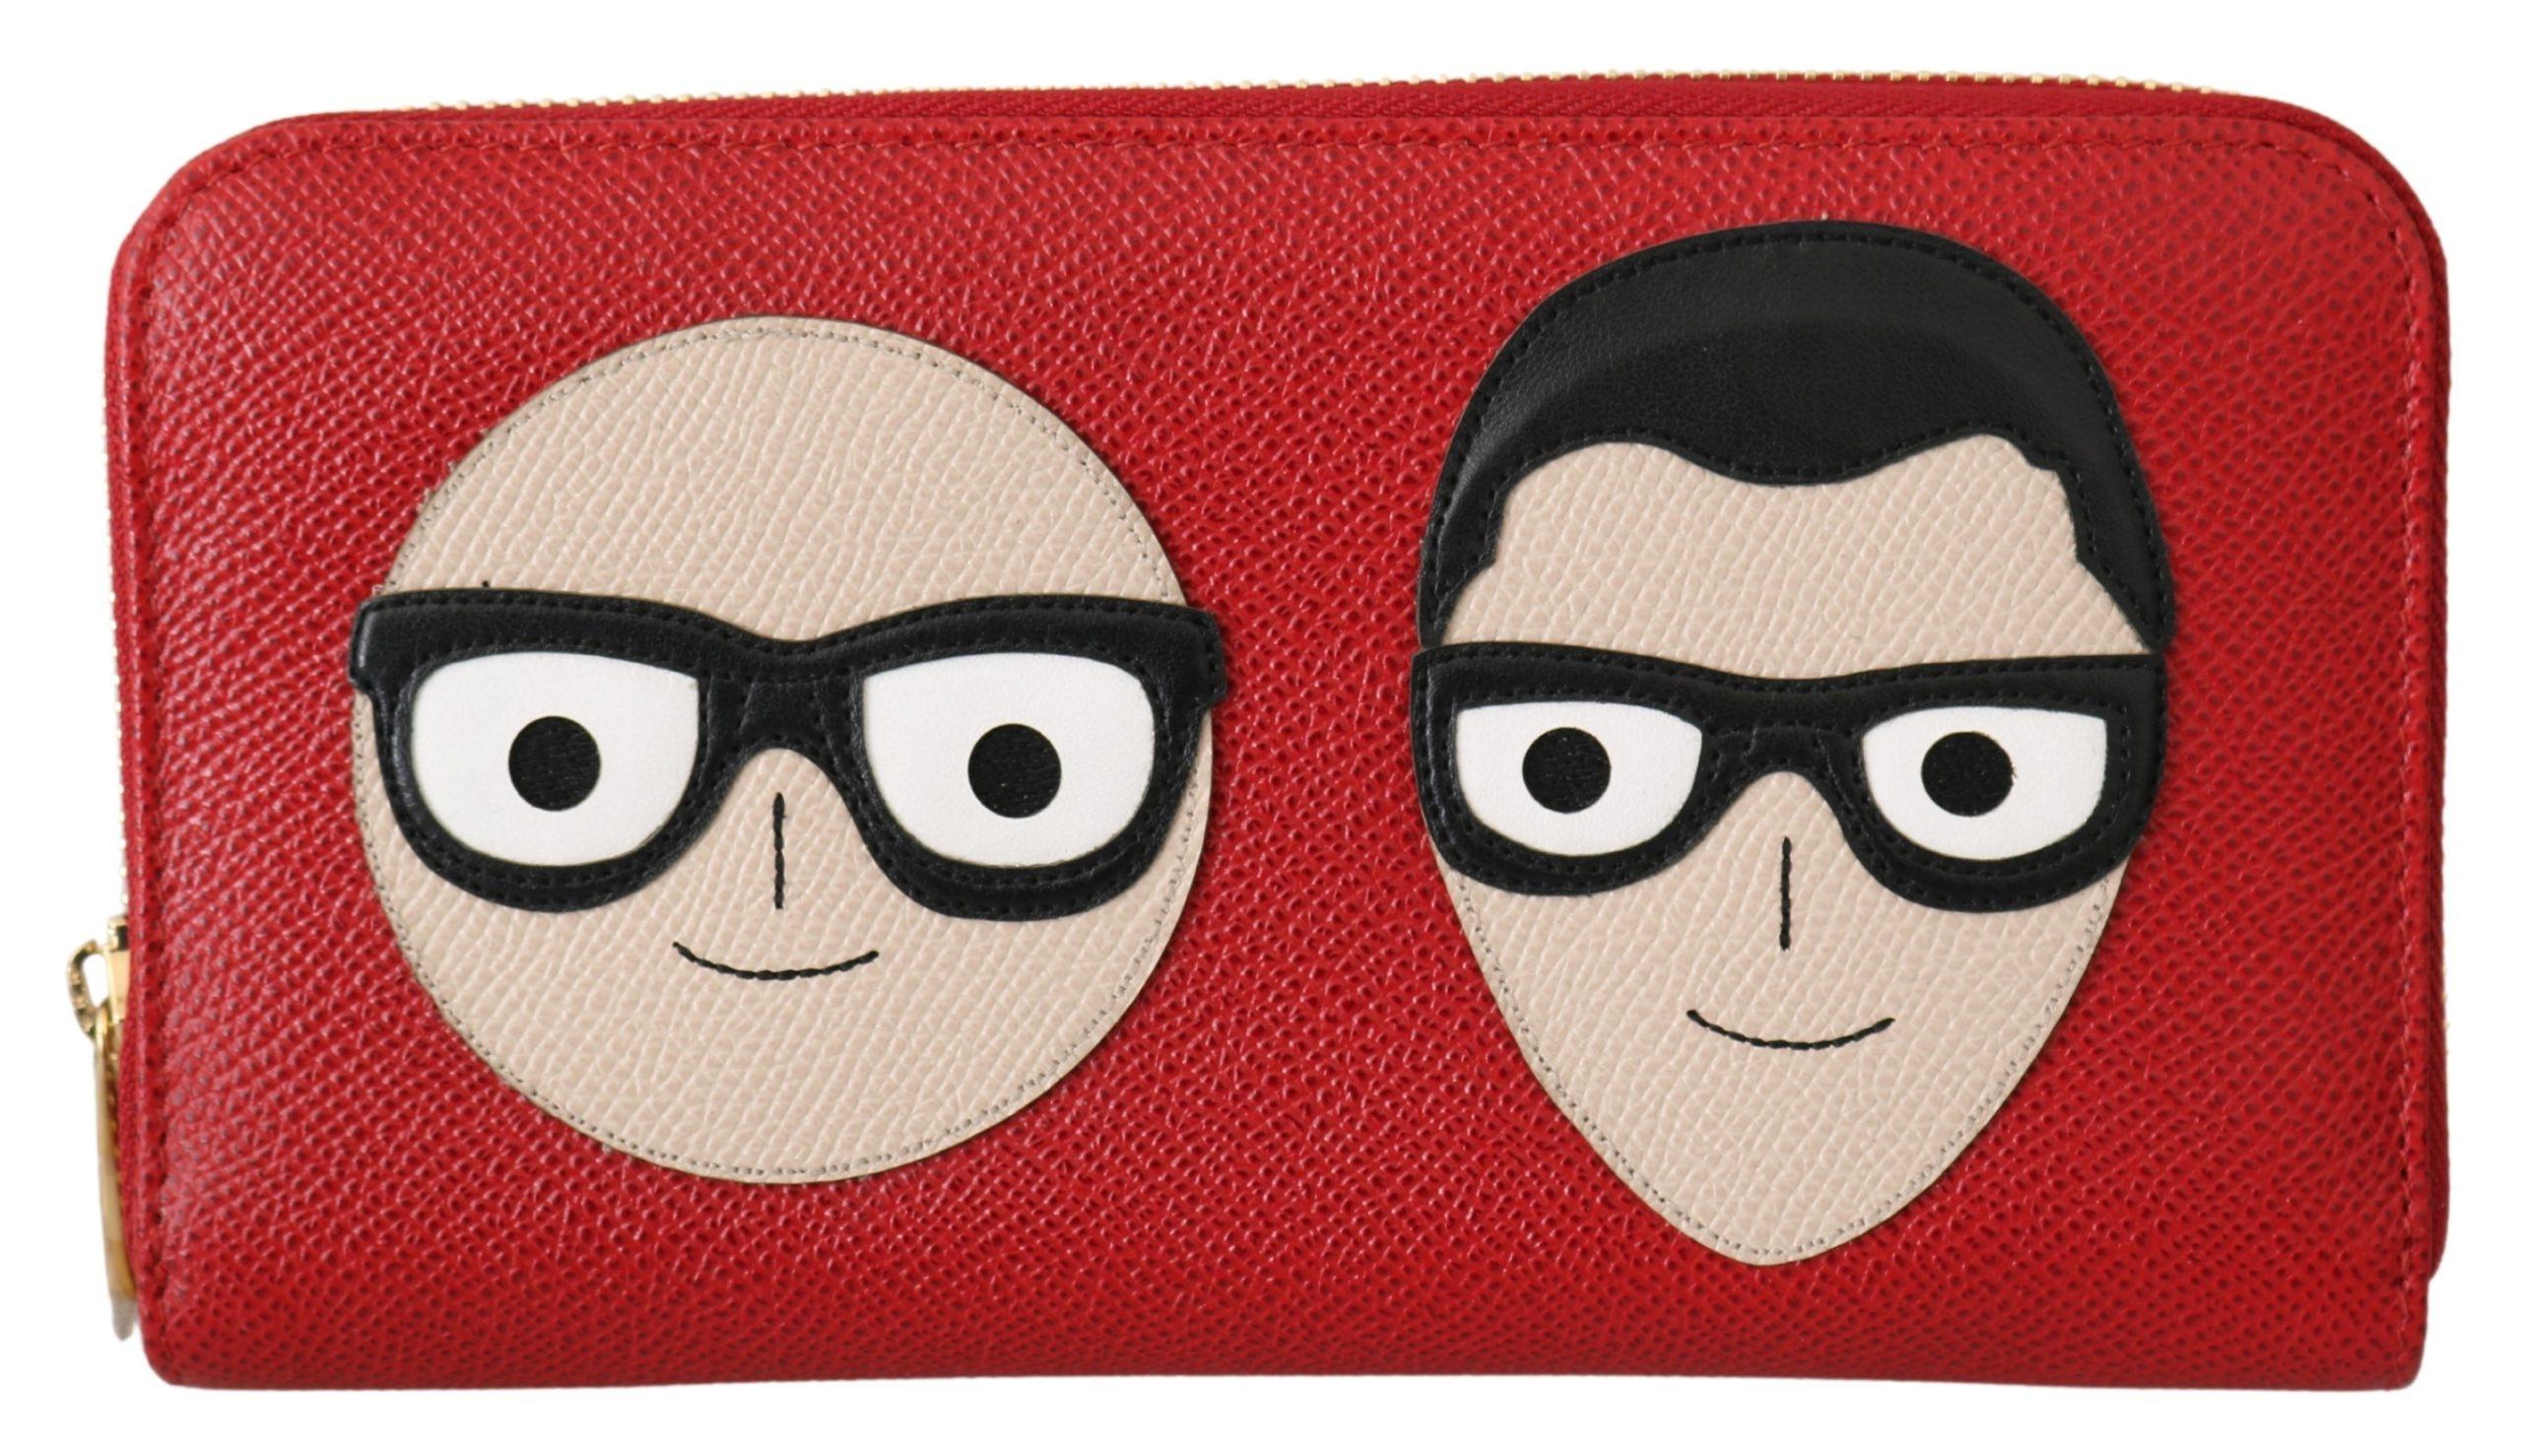 Dolce & Gabbana Women's #dgfamily Continental Clutch Leather Wallet Red VAS9665